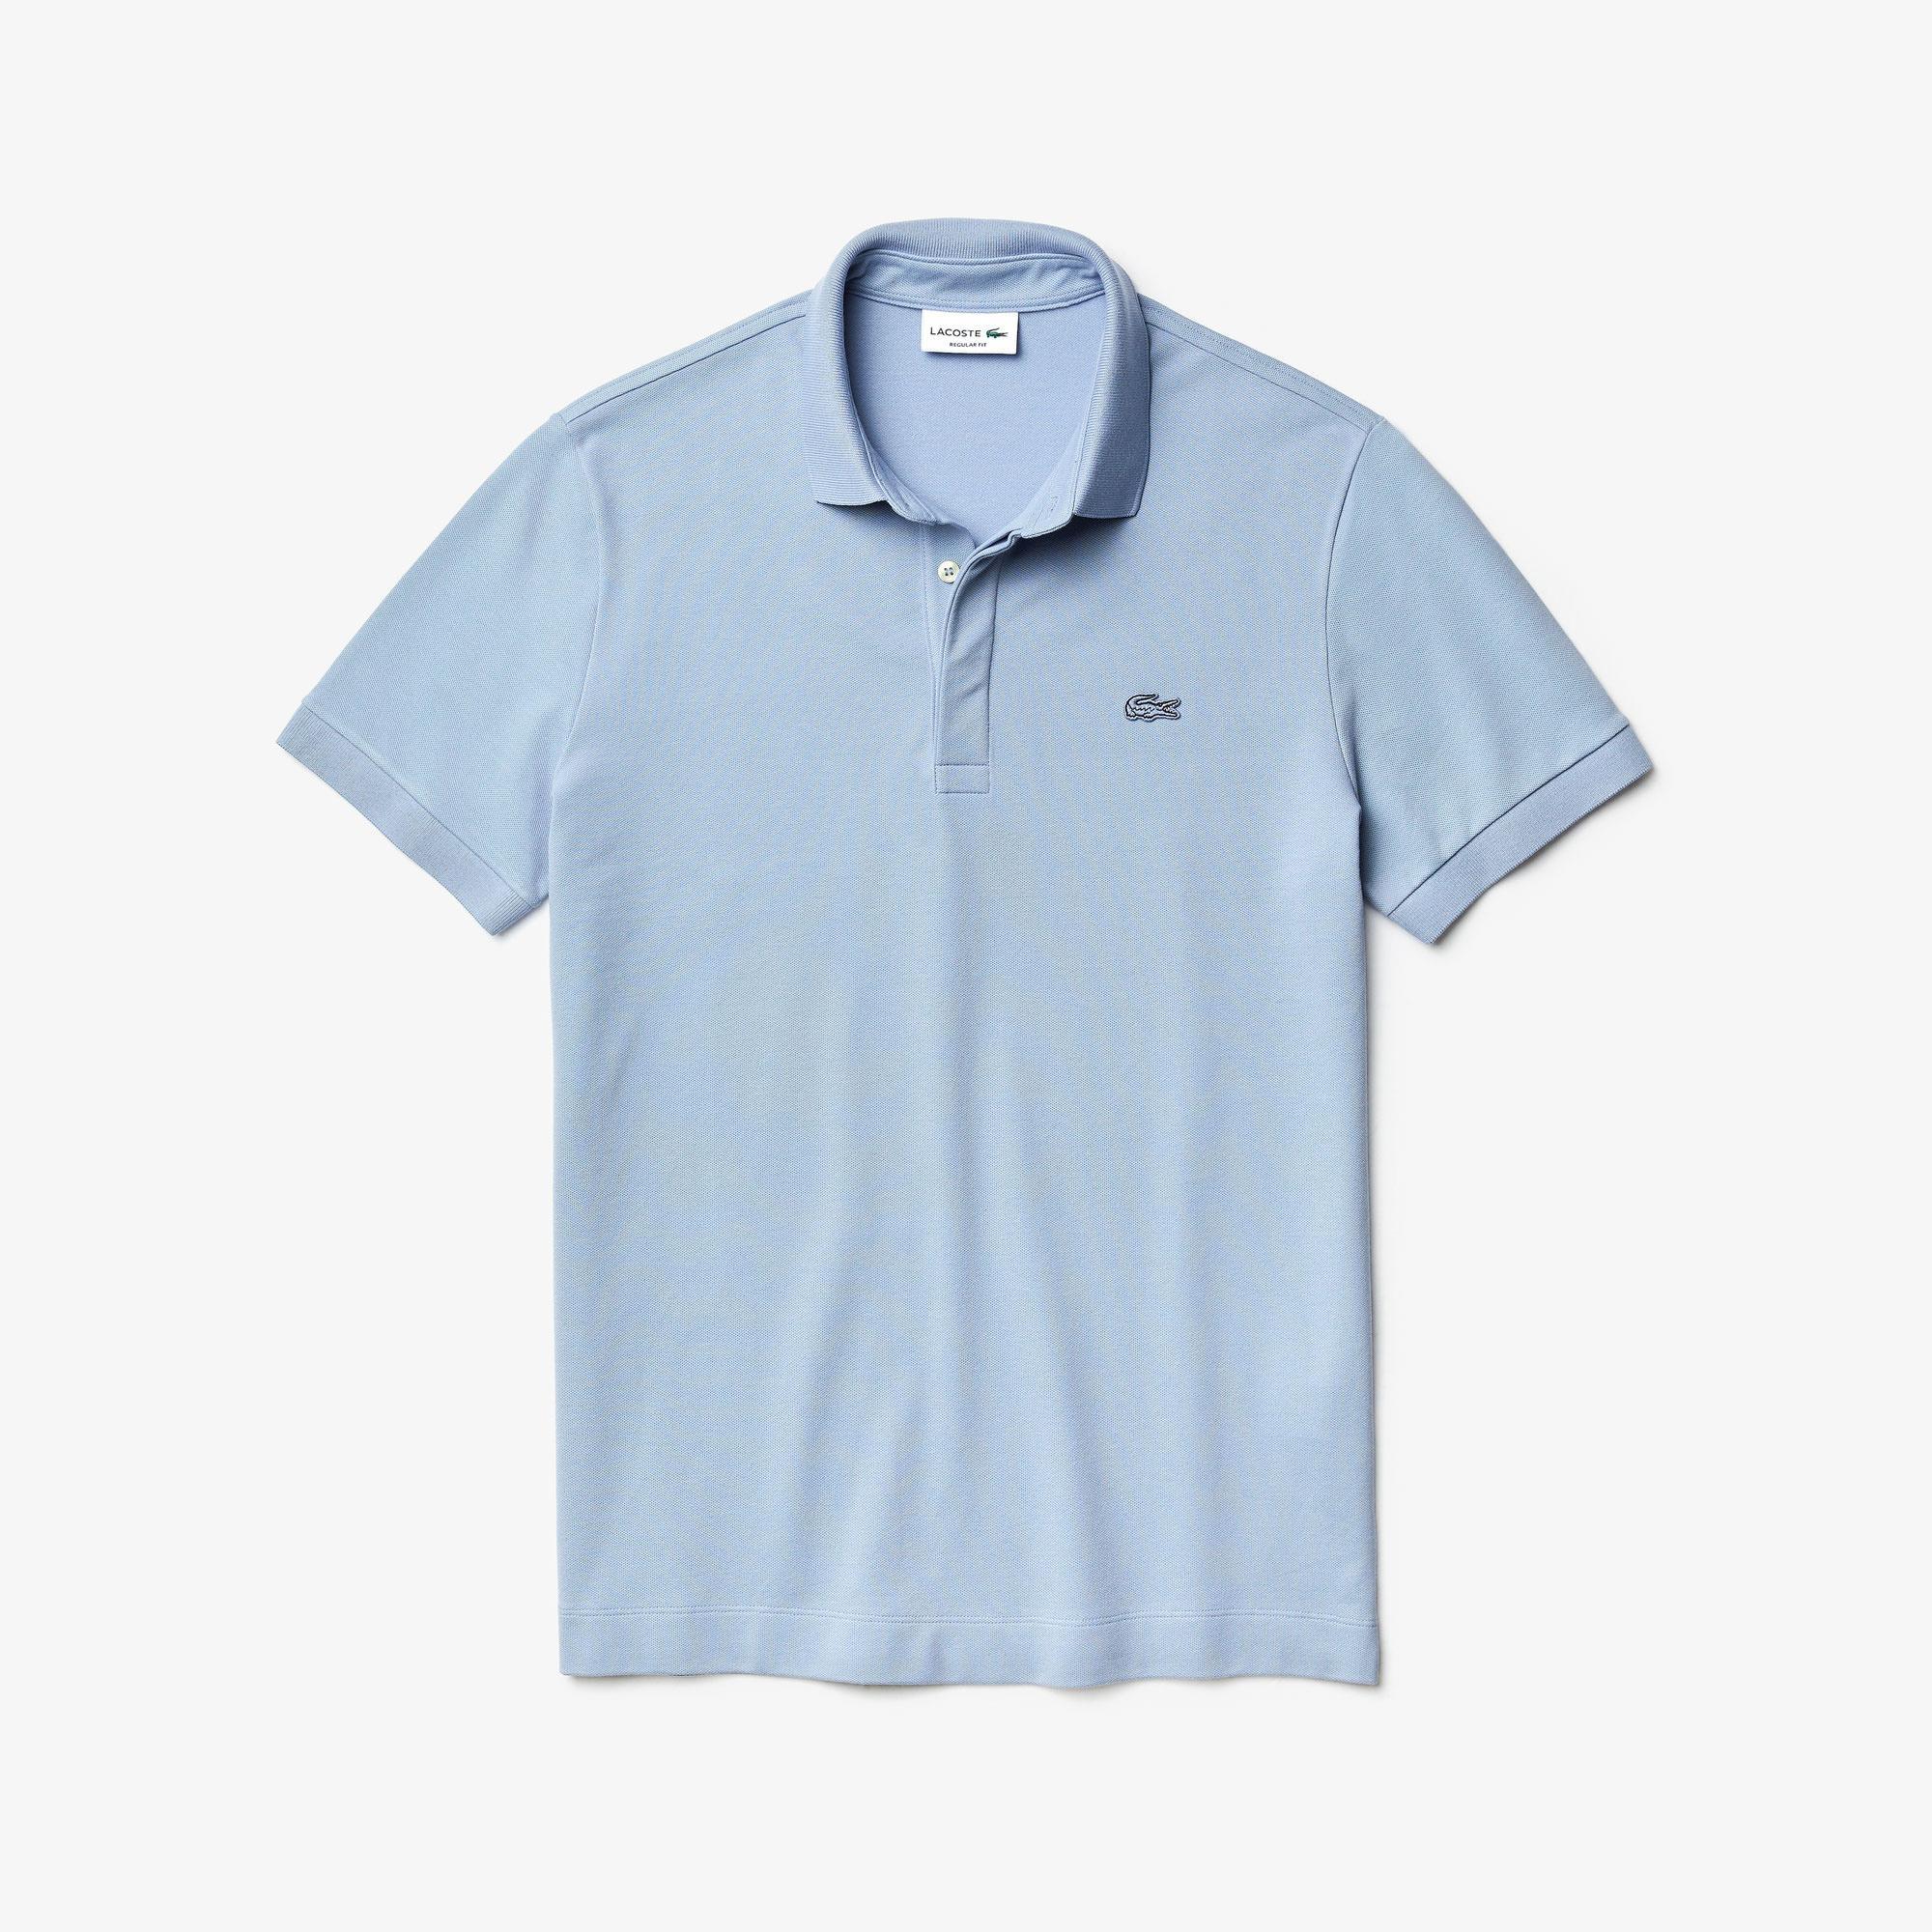 Lacoste Erkek Regular Fit Mavi Polo